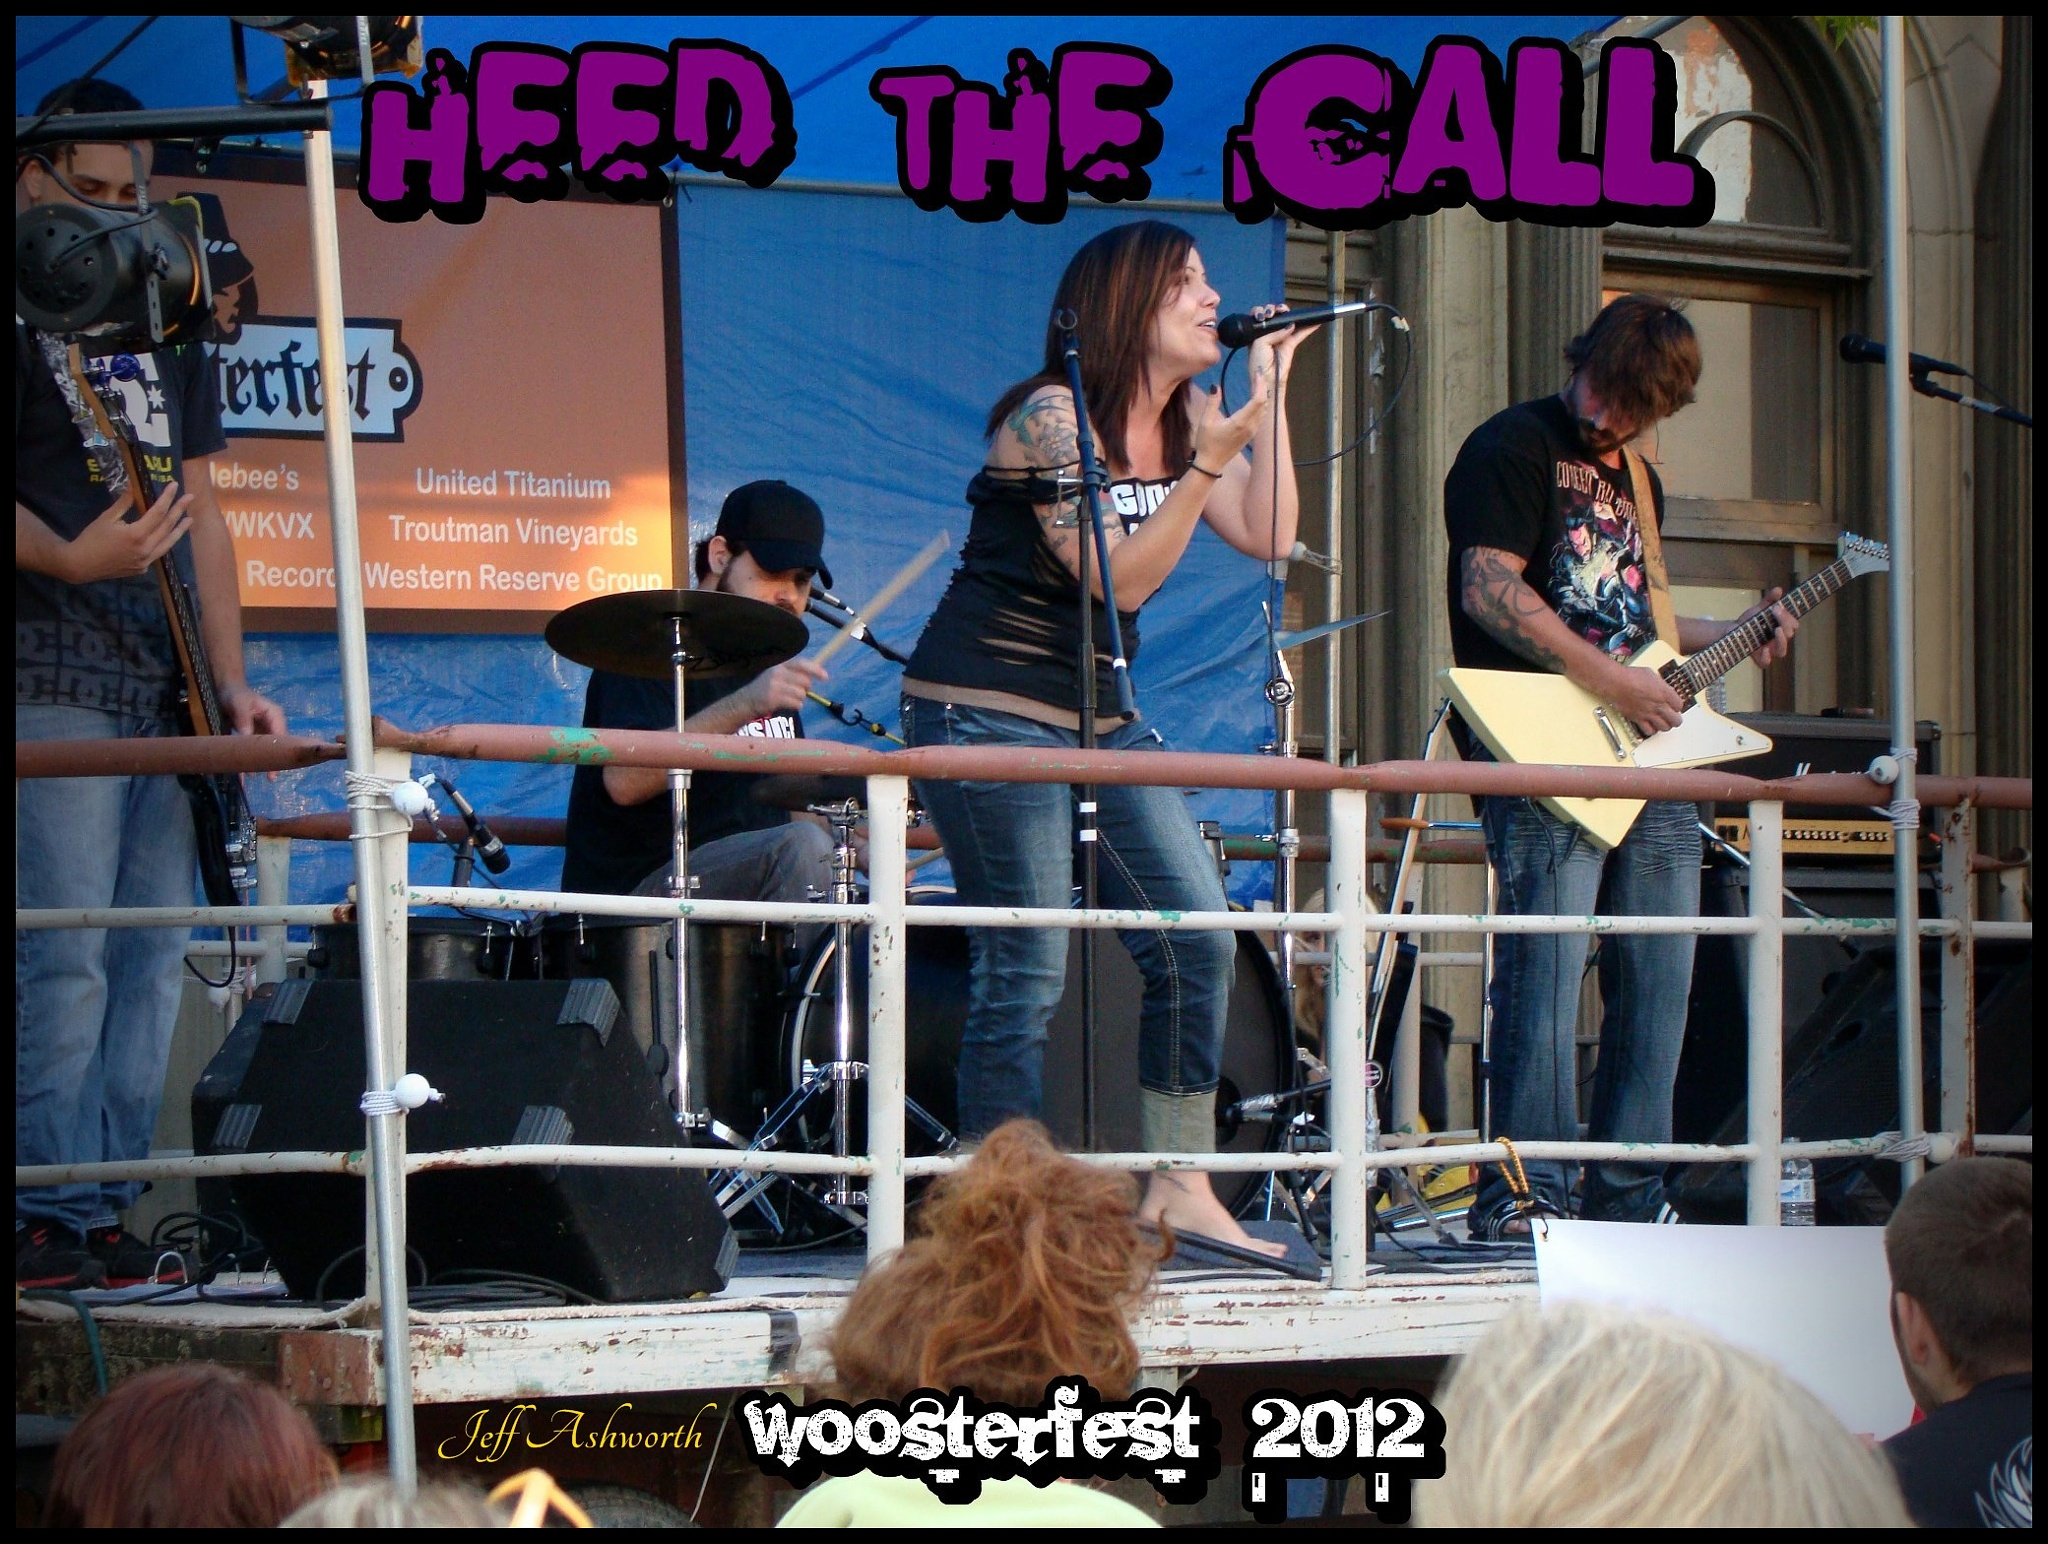 Heed The Call by jeffashworth